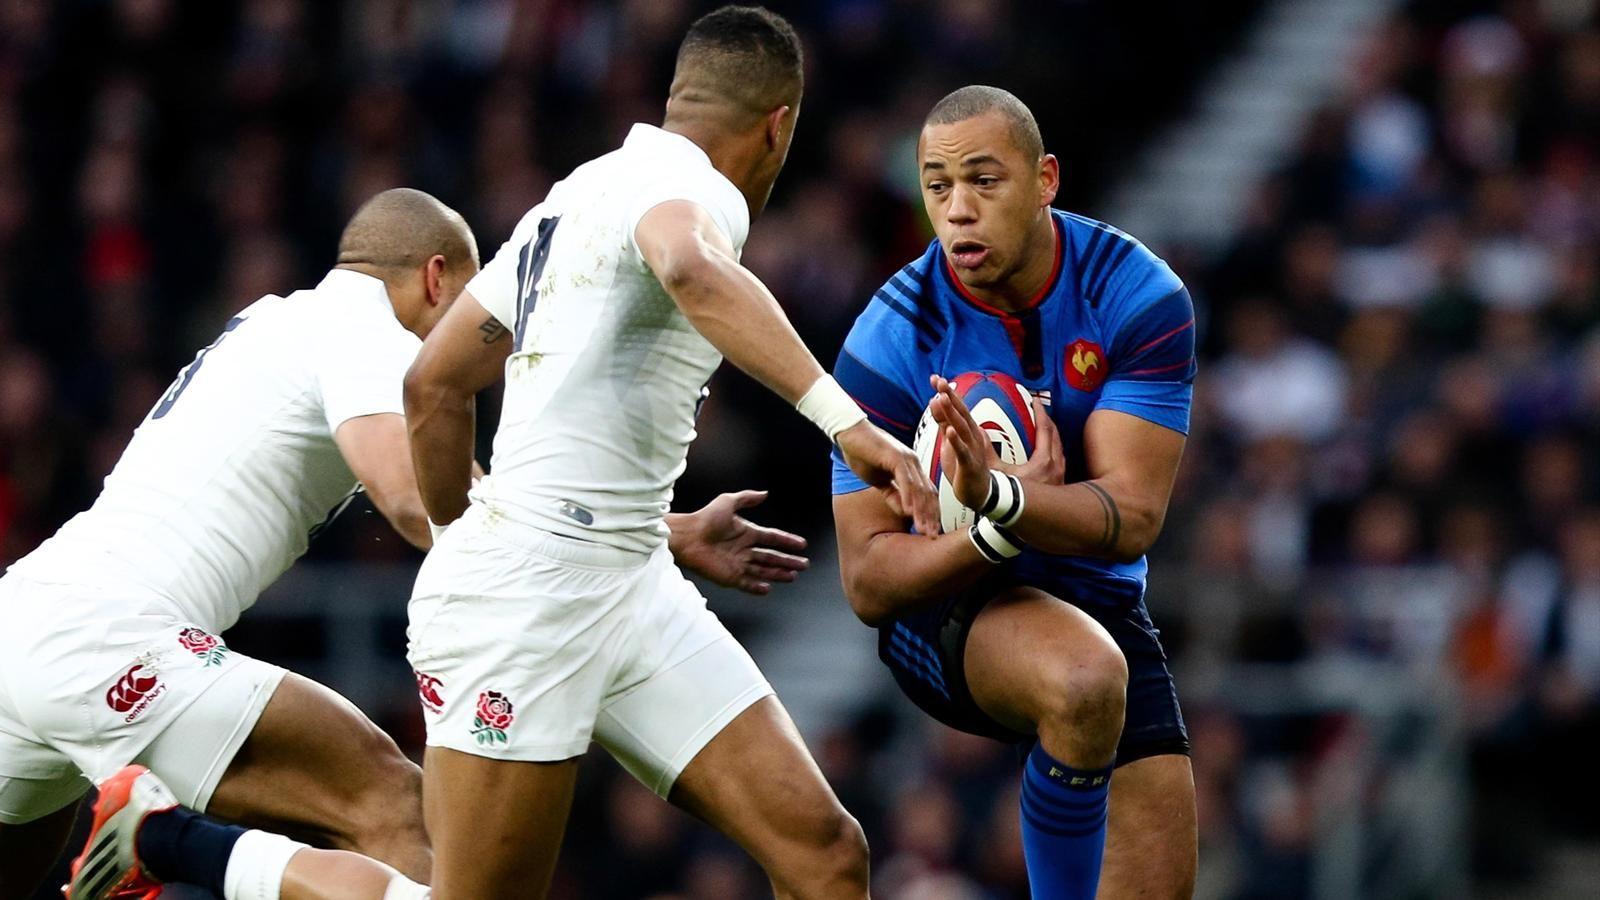 Angleterre France 55 35 Les Notes Fickou En Impose Plisson Passe Au Travers Xv De France France Rugby